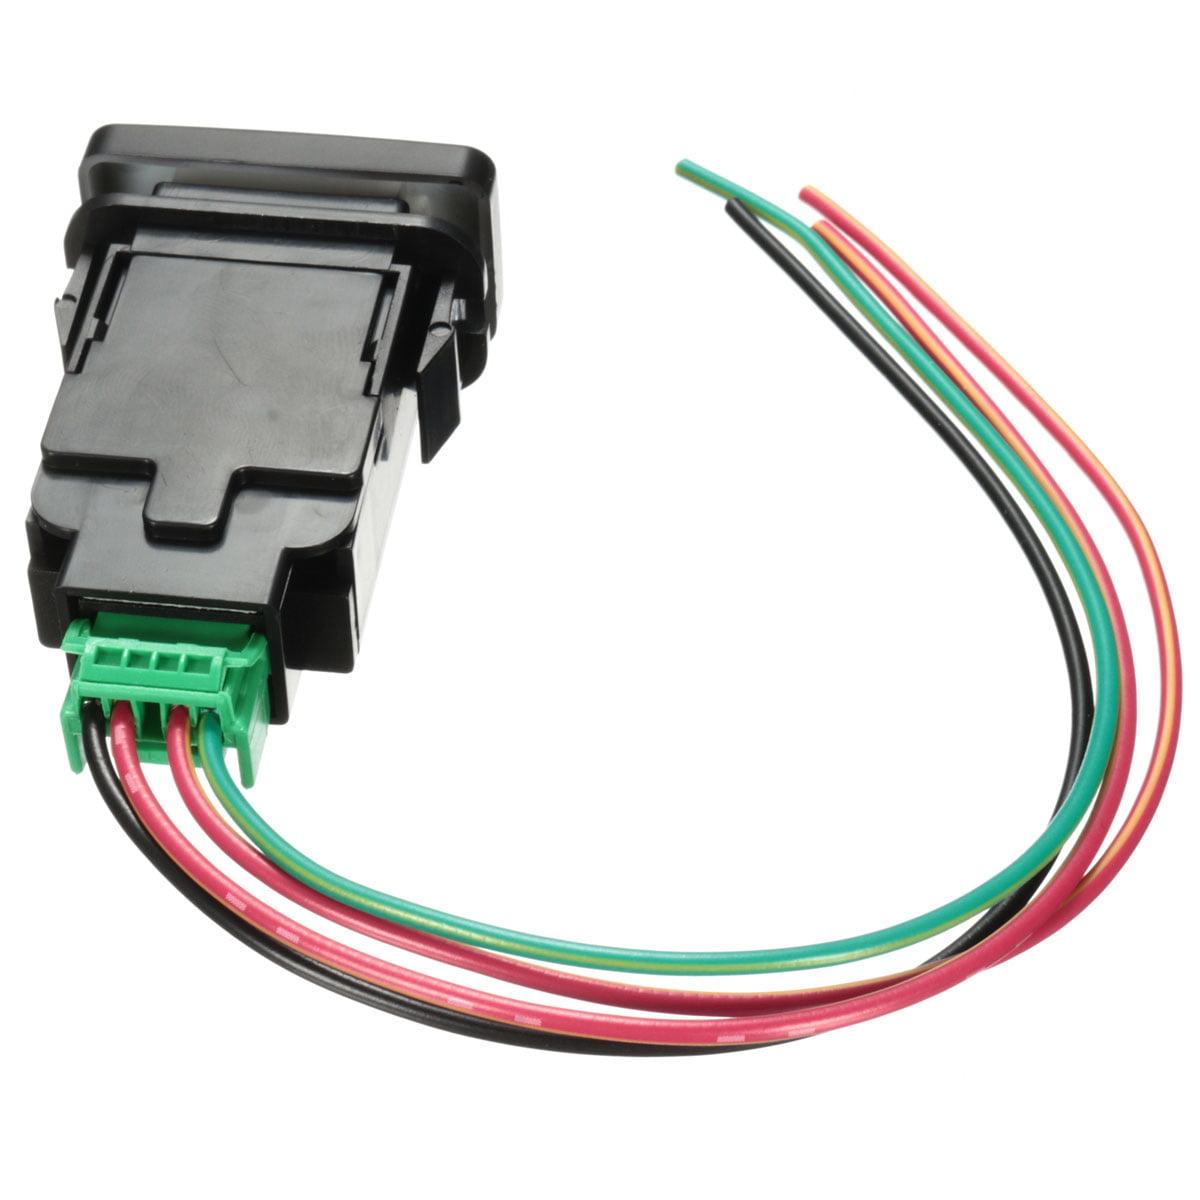 Led Push Button Switch On Off W Harness 12v Red For Landcruiser Wiring A Lamp Hilux Prado Fj Cruise Light Bar Fog Spot Driving Reverse Rear Matcc Usreverse